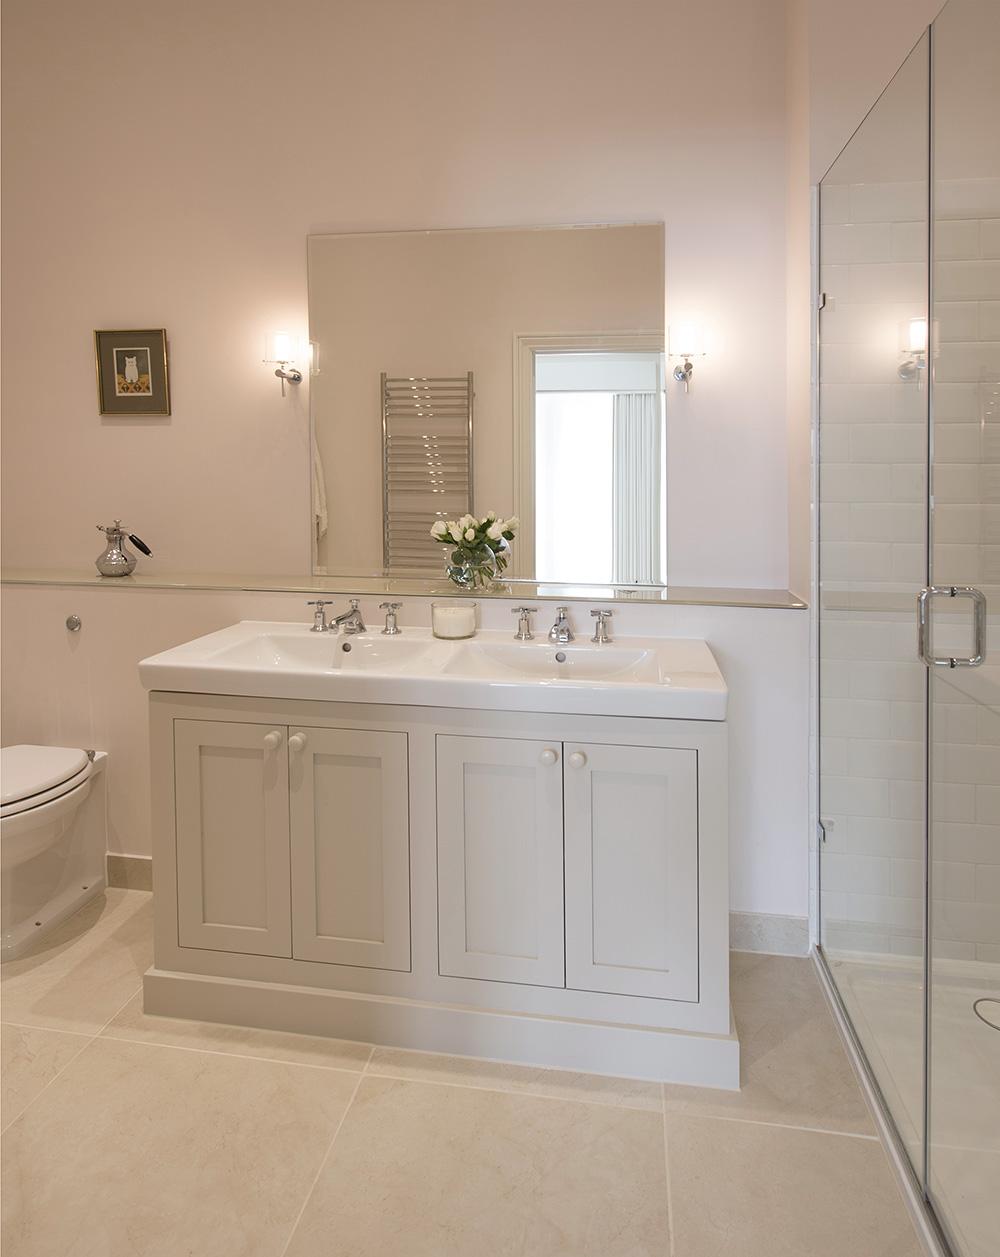 traditional Bathroom vanity unit, ensuite, shower room, Nikkirees.com, wimbledon interior designer, london and surrey interior design